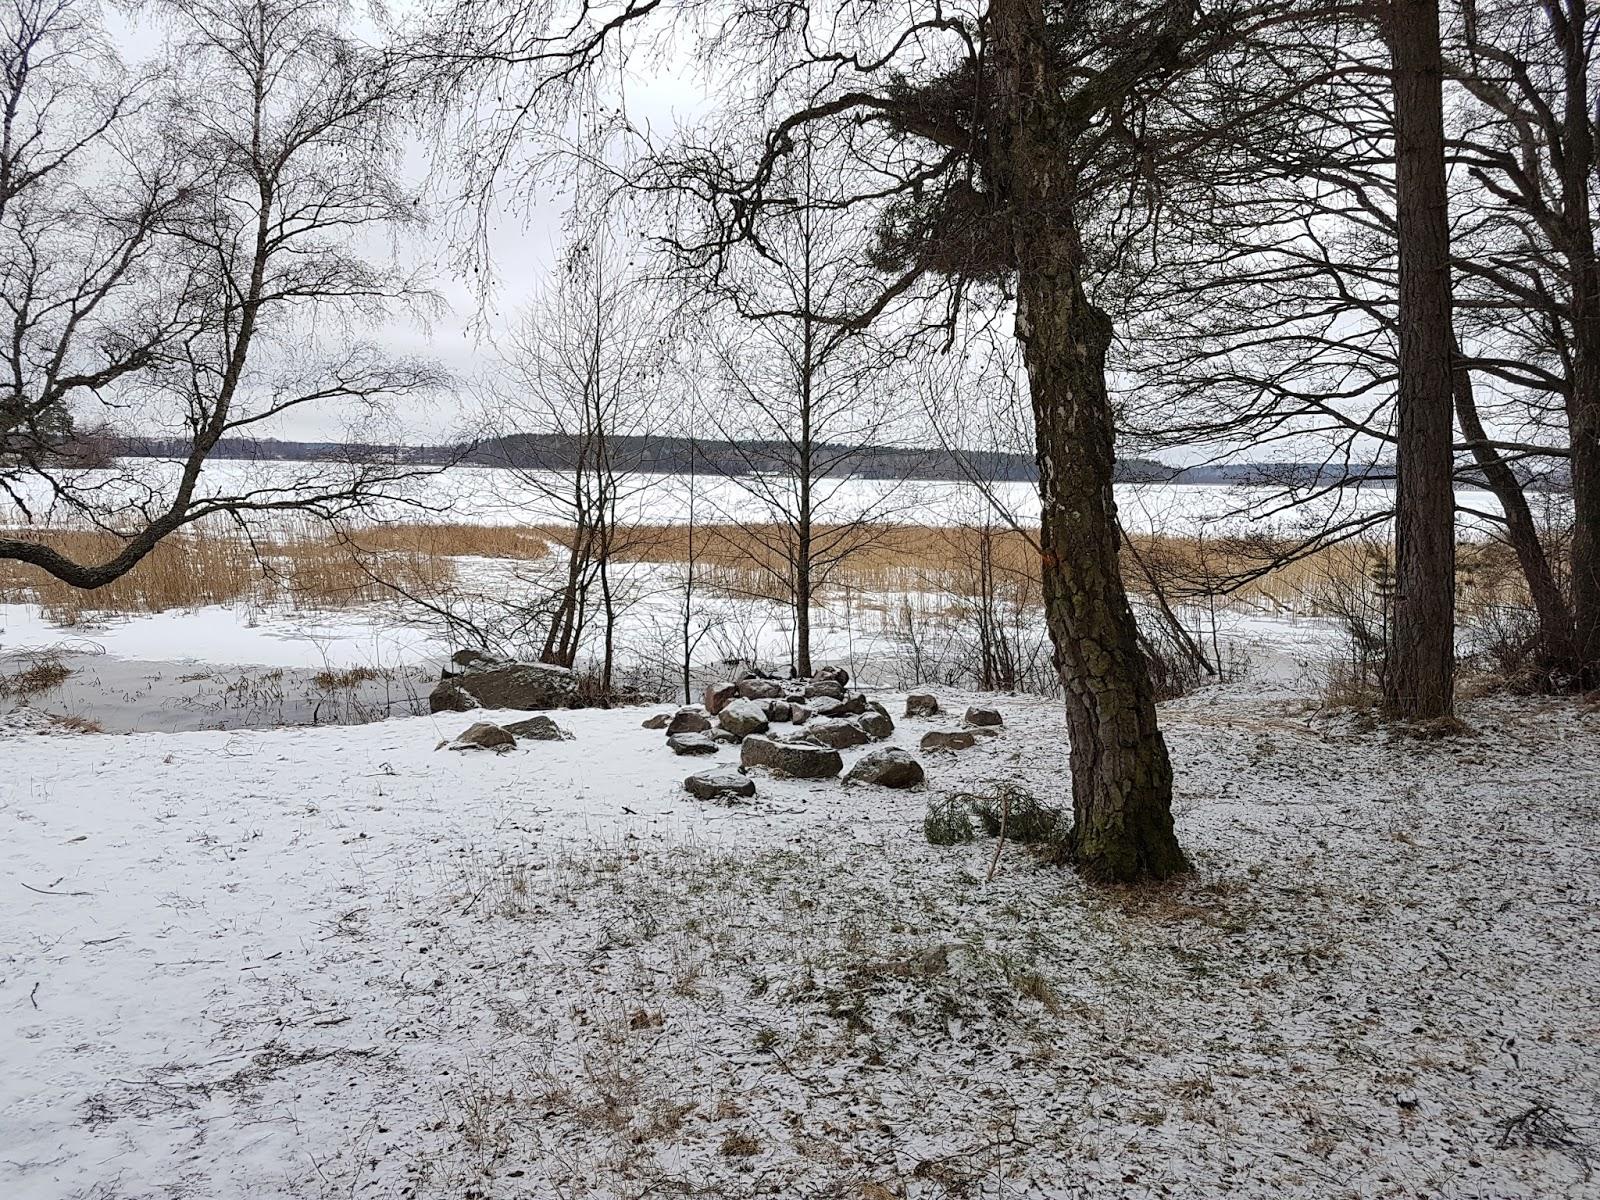 Team Vildmark: Roslagsleden etapp 1: Karby Gård Danderyd